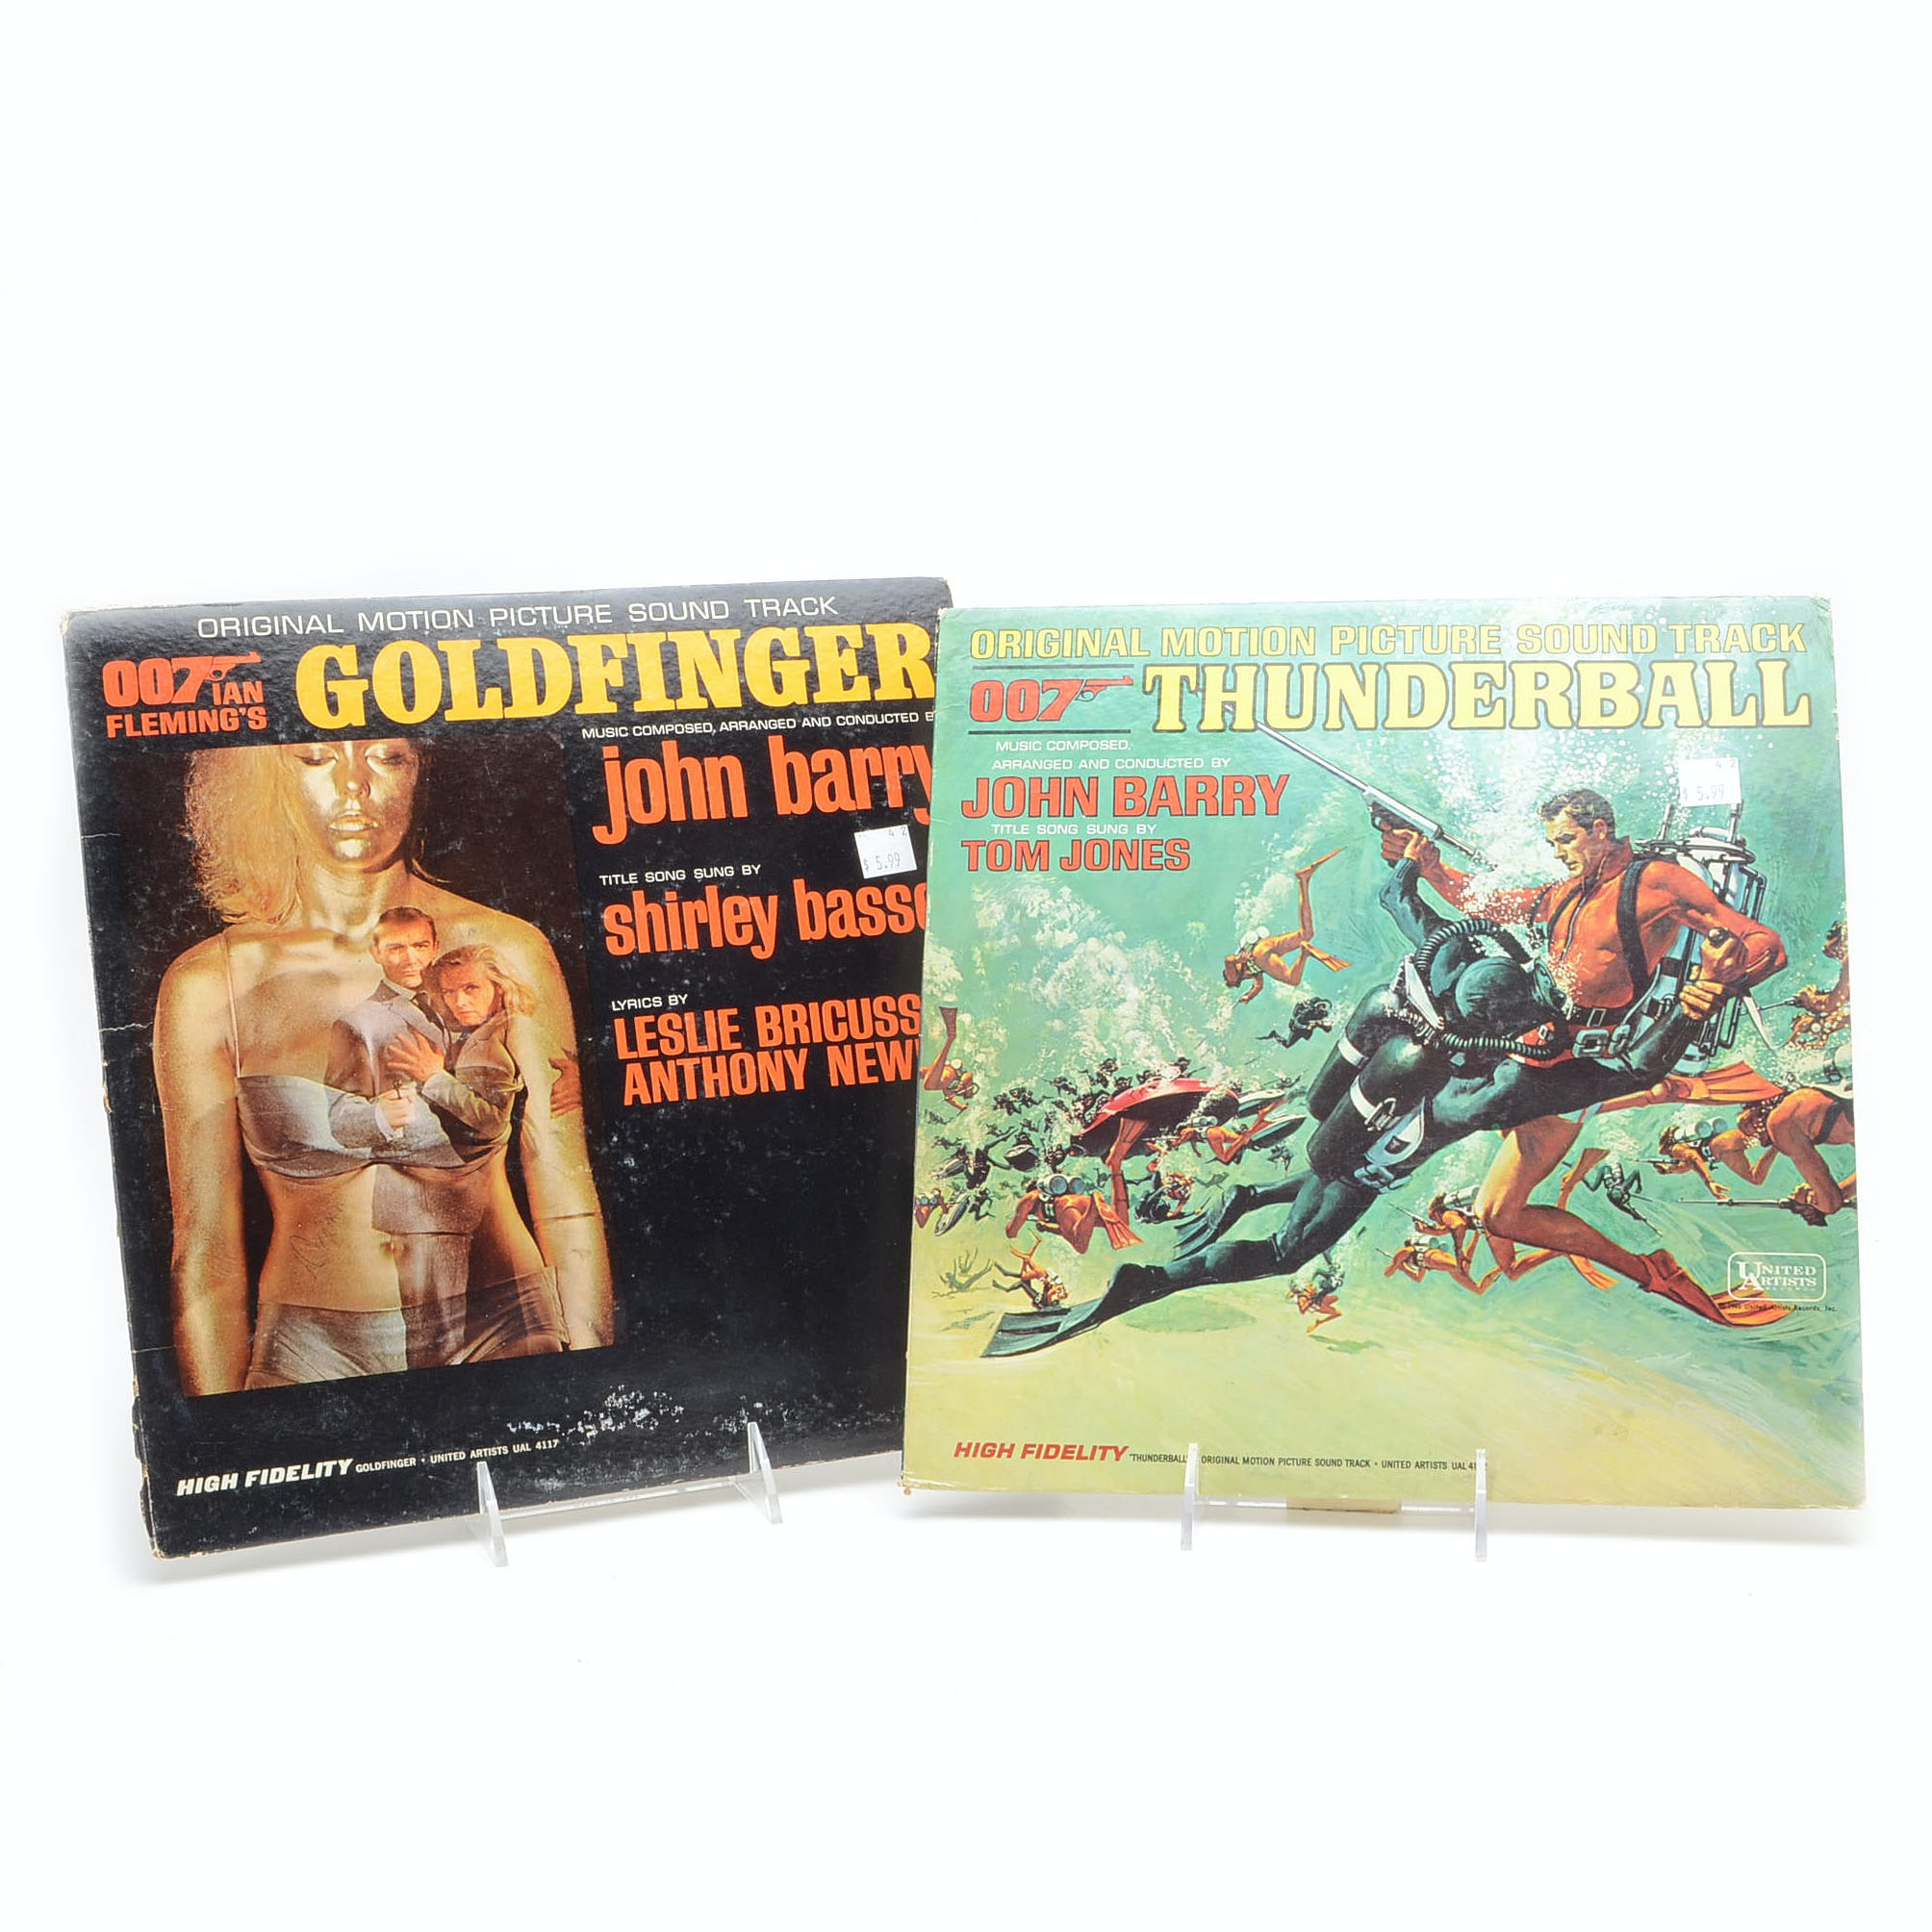 Pairing of James Bond Soundtrack Albums